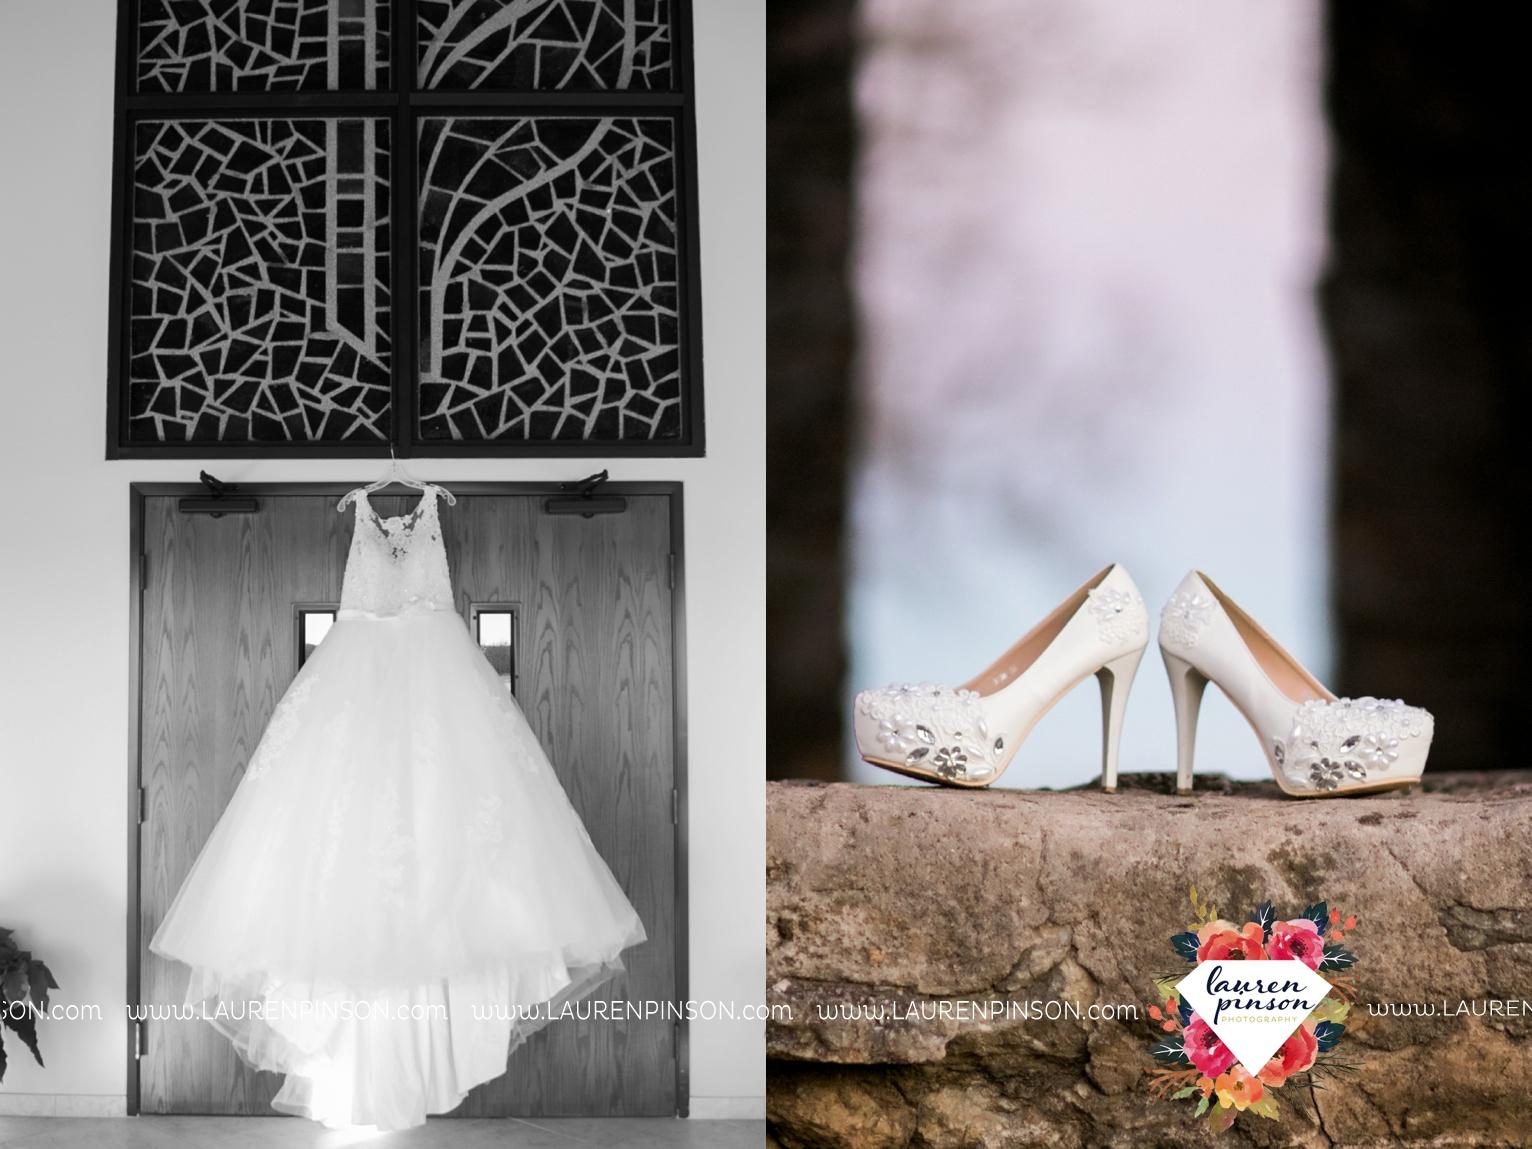 durant-oklahoma-methodist-church-fort-washita-wedding-photographer-00001.jpg